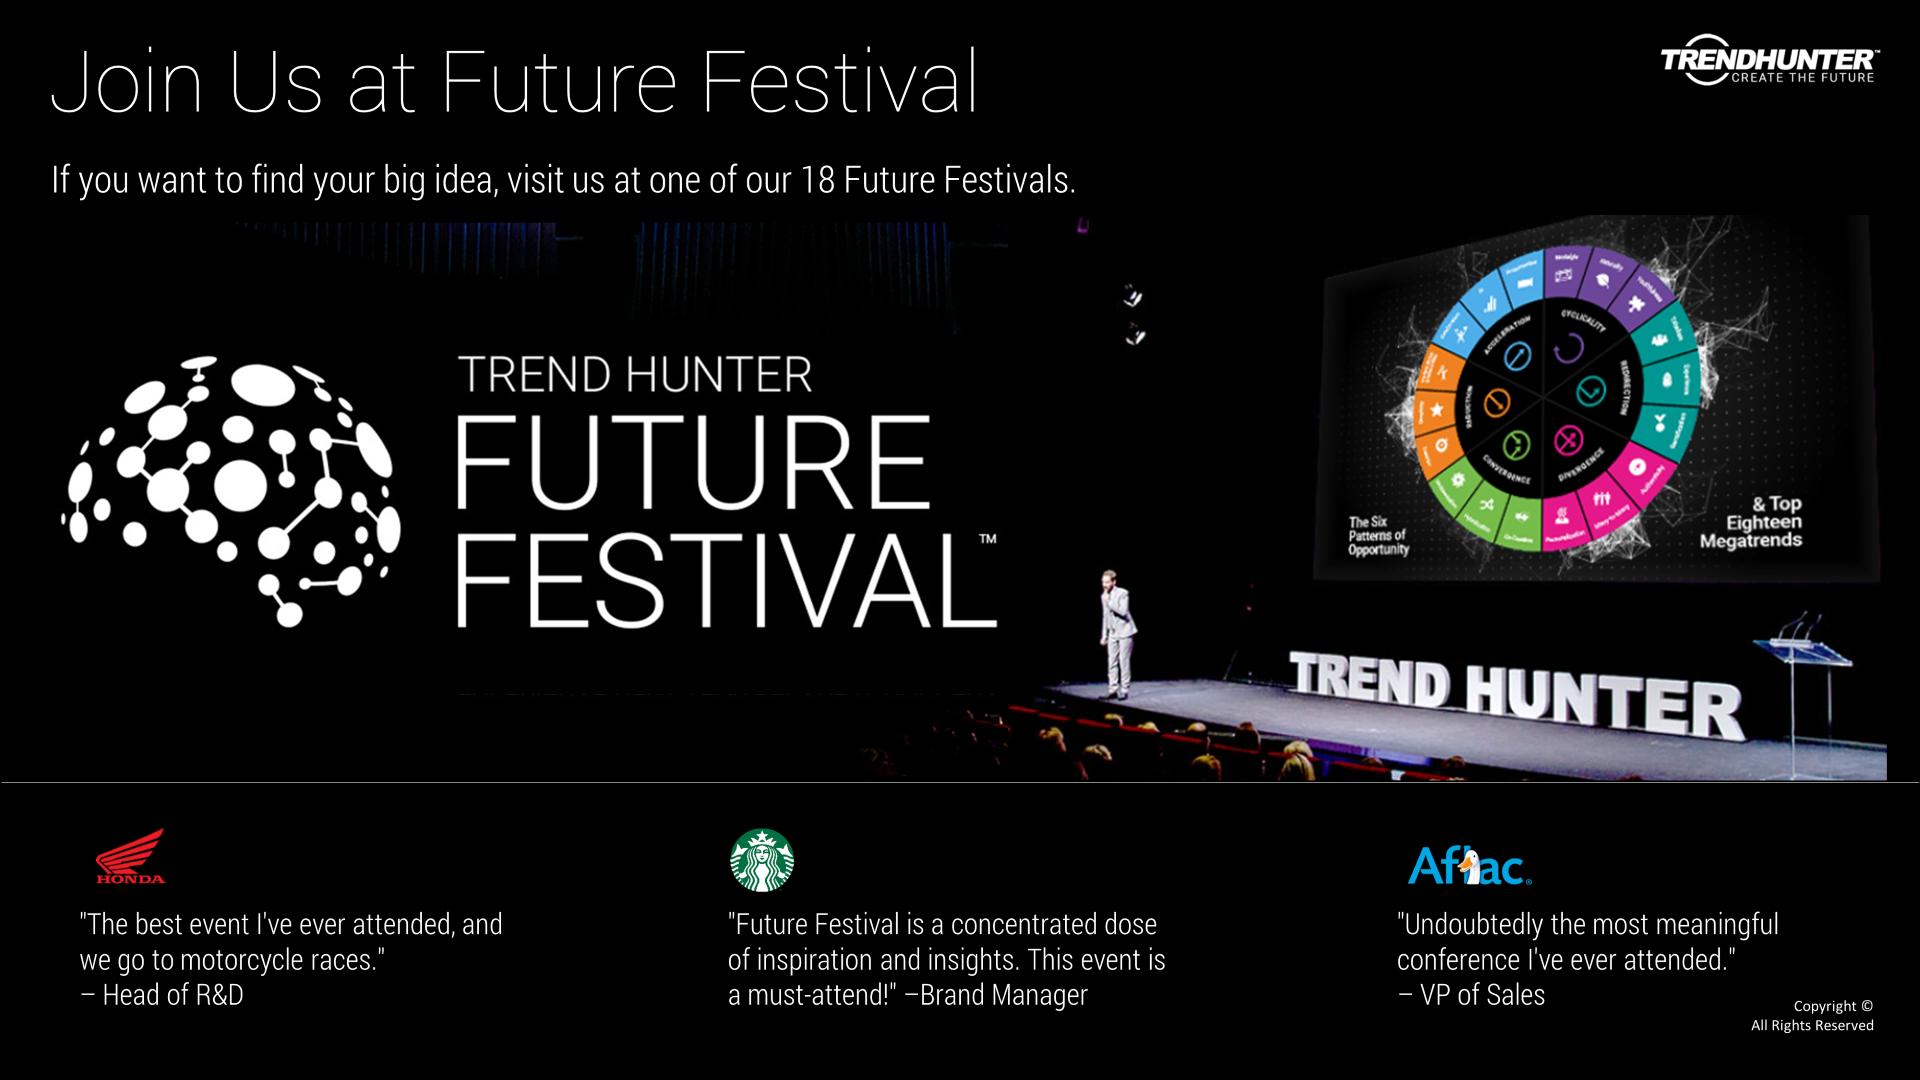 Image Slide: Join us at Future Festival